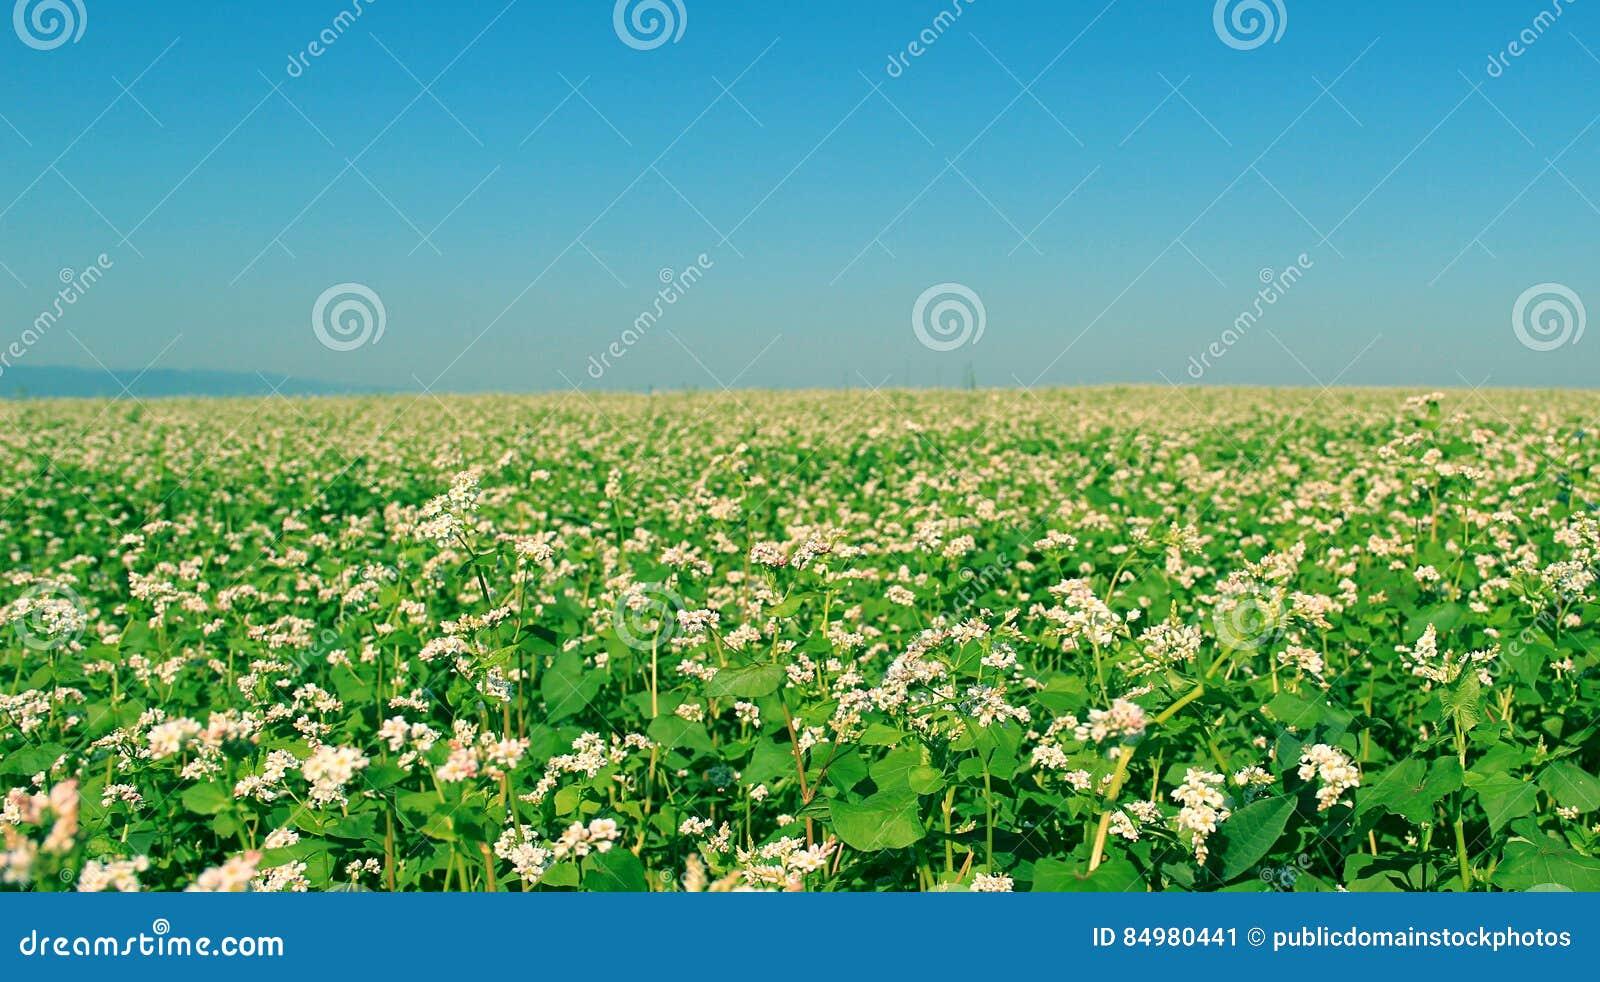 Download Field Of Green Flowering Plants Stock Image - Image of plants, horizon: 84980441